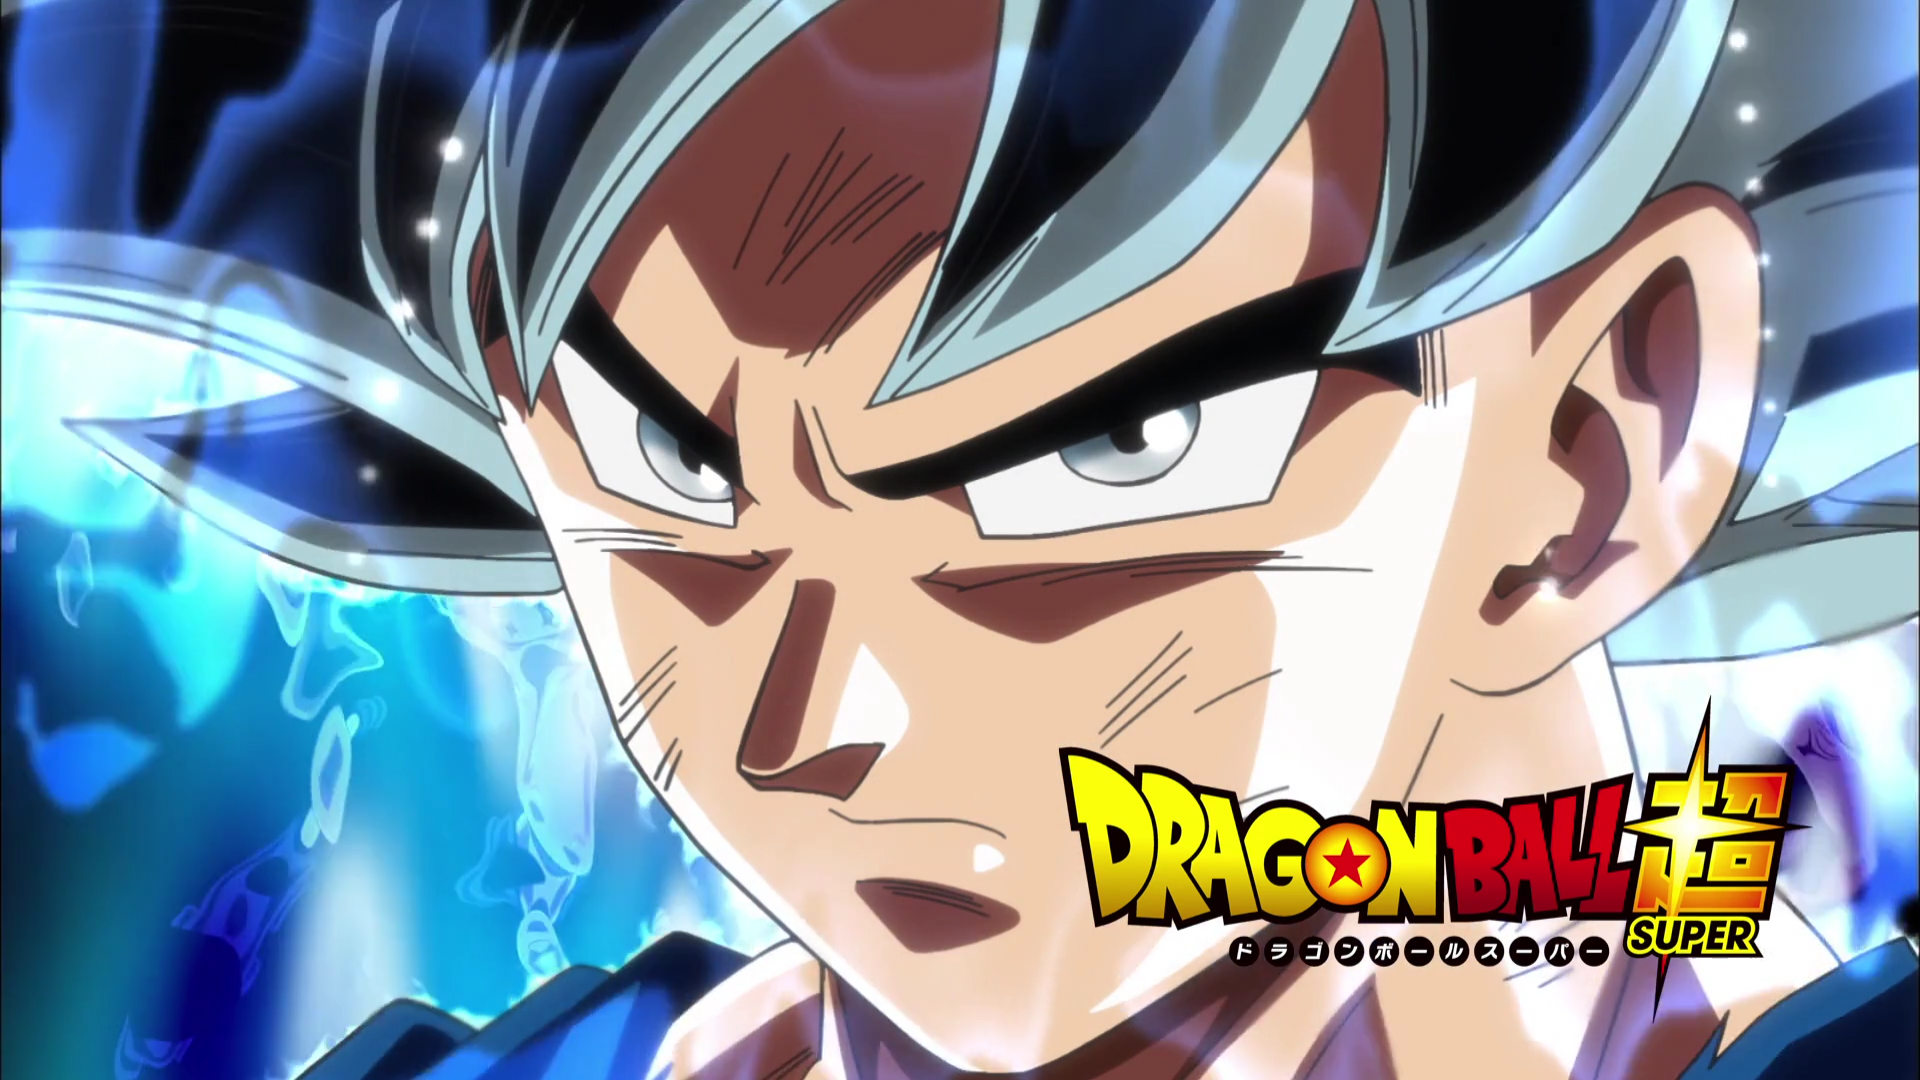 Goku Wallpaper Ps4